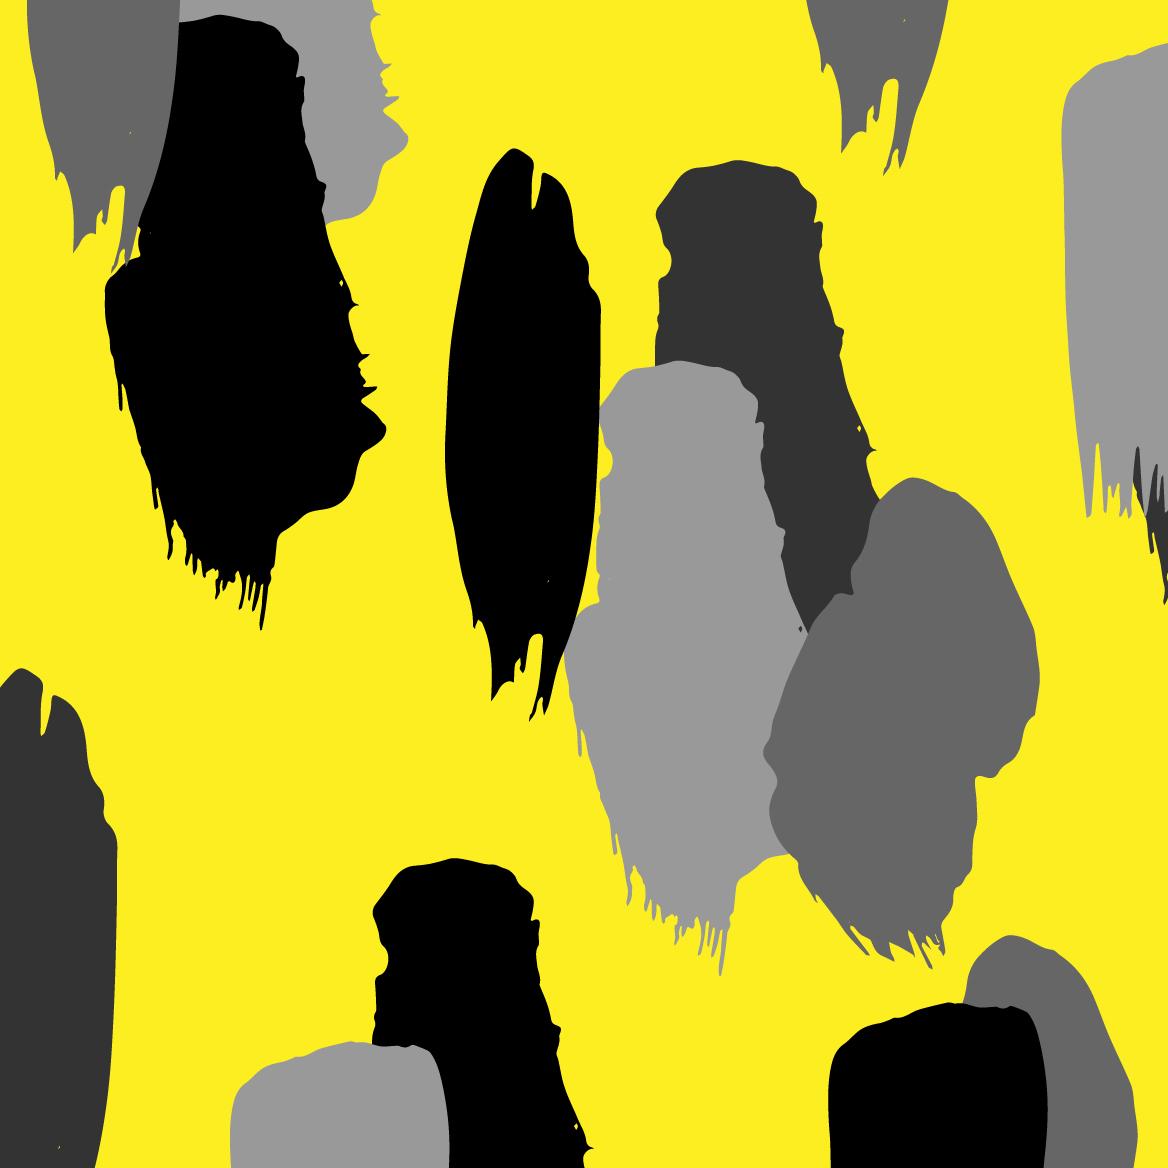 vfxjohow-brush-strokes-yellow-greyscale-design-pattern-04.jpg